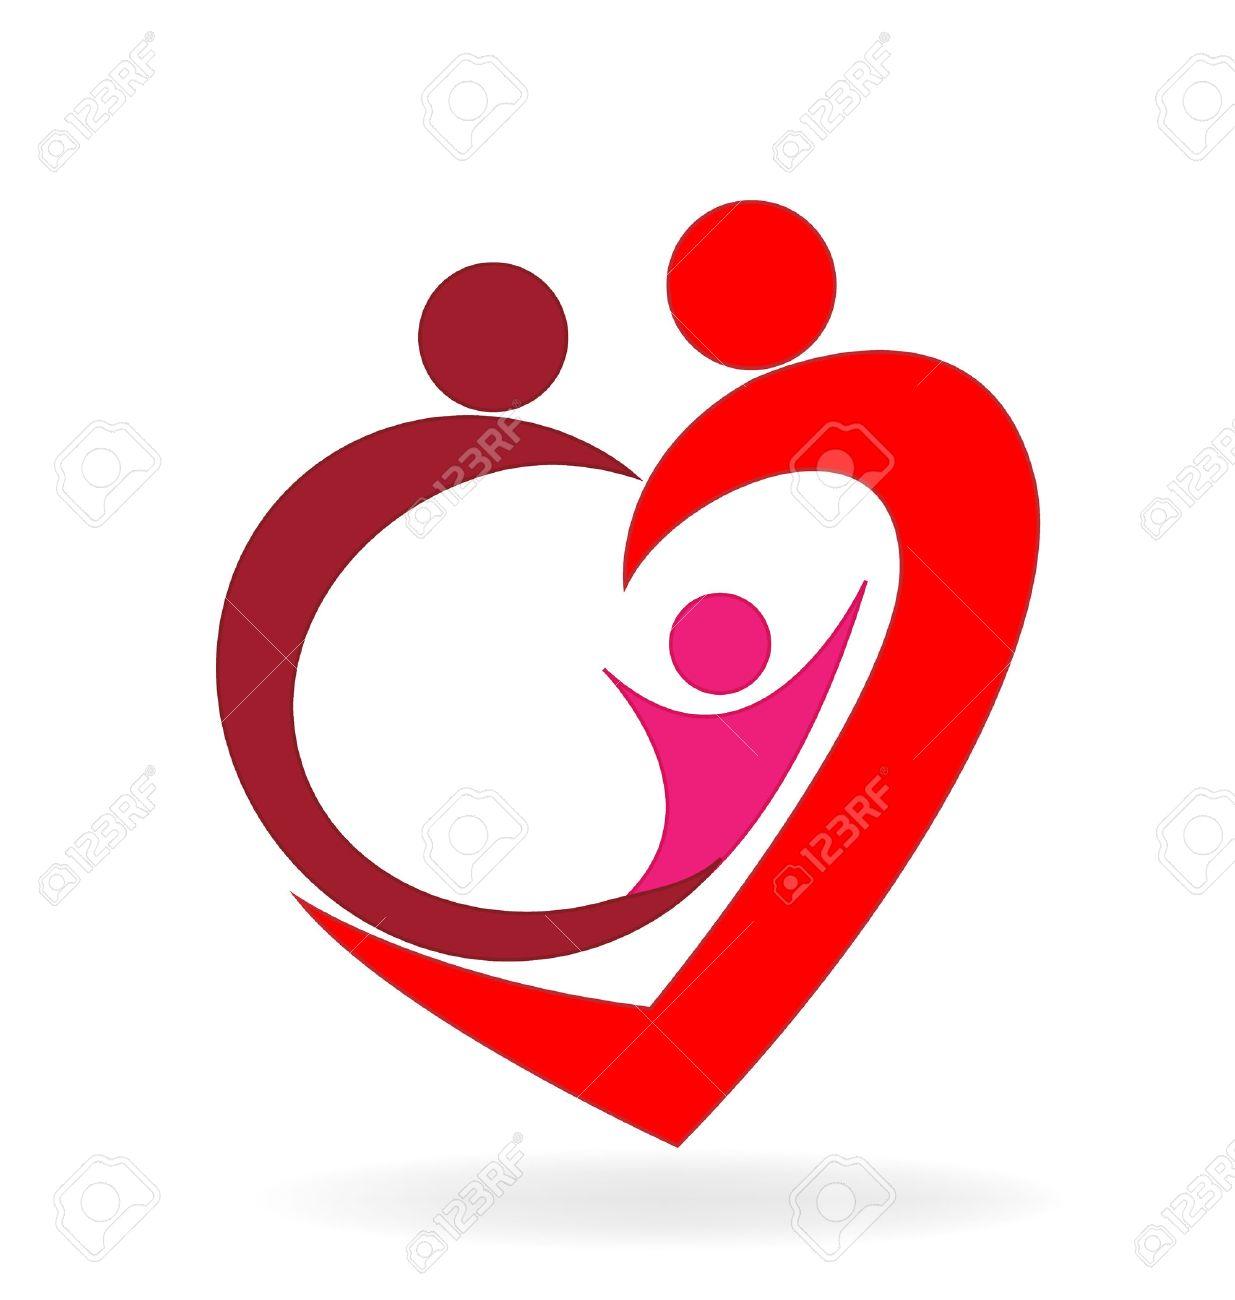 Family Love Heart Symbol Logo Vector Image Royalty Free Cliparts